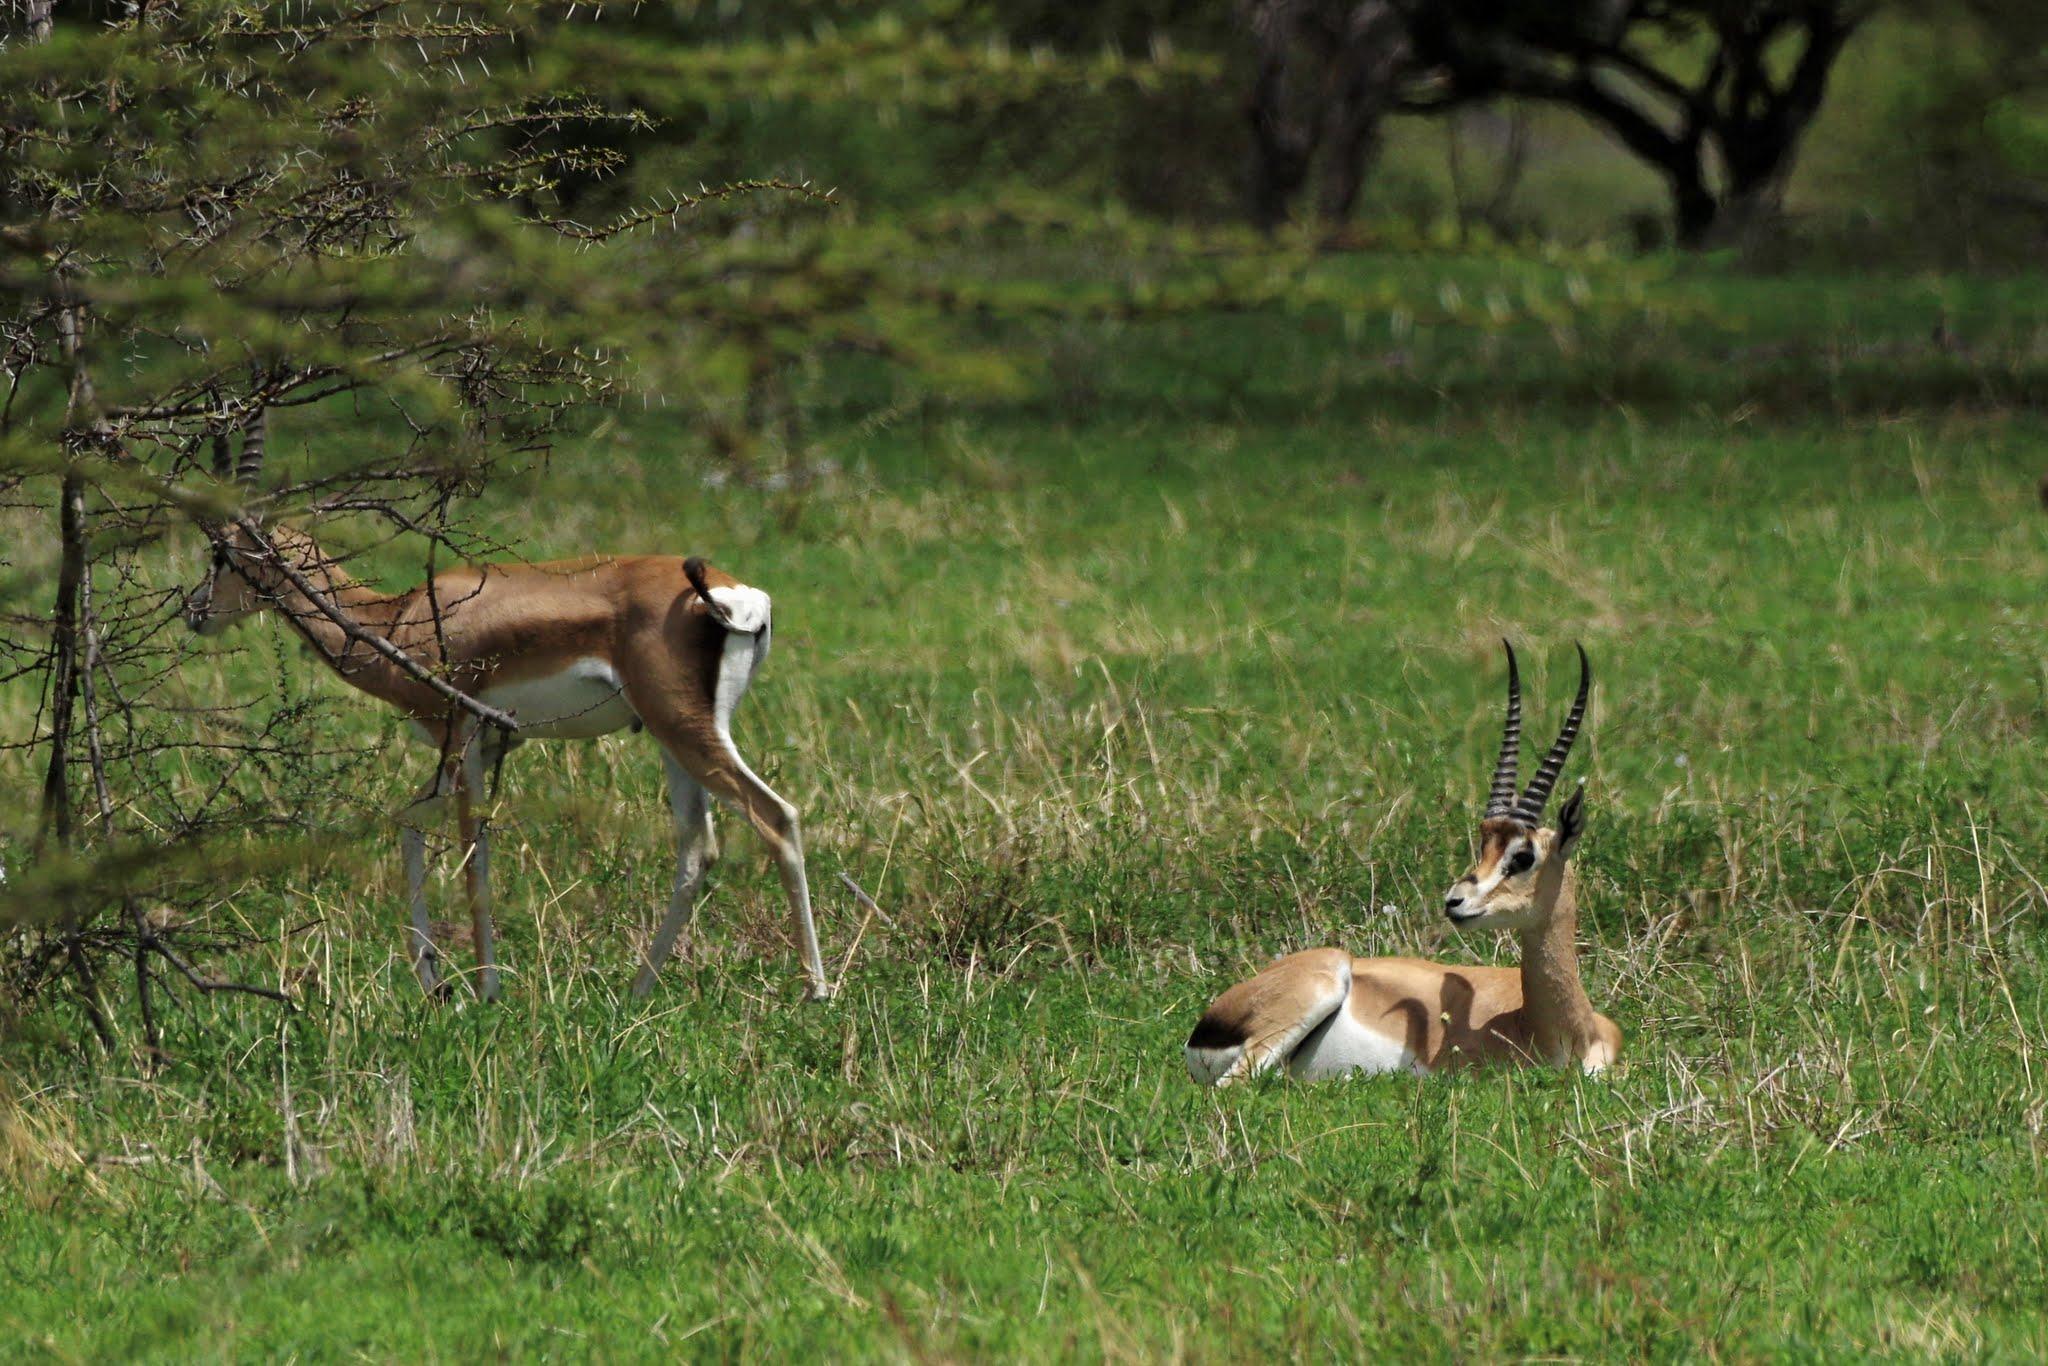 gazelle-de-thomson-tarangire-11-15_dxo